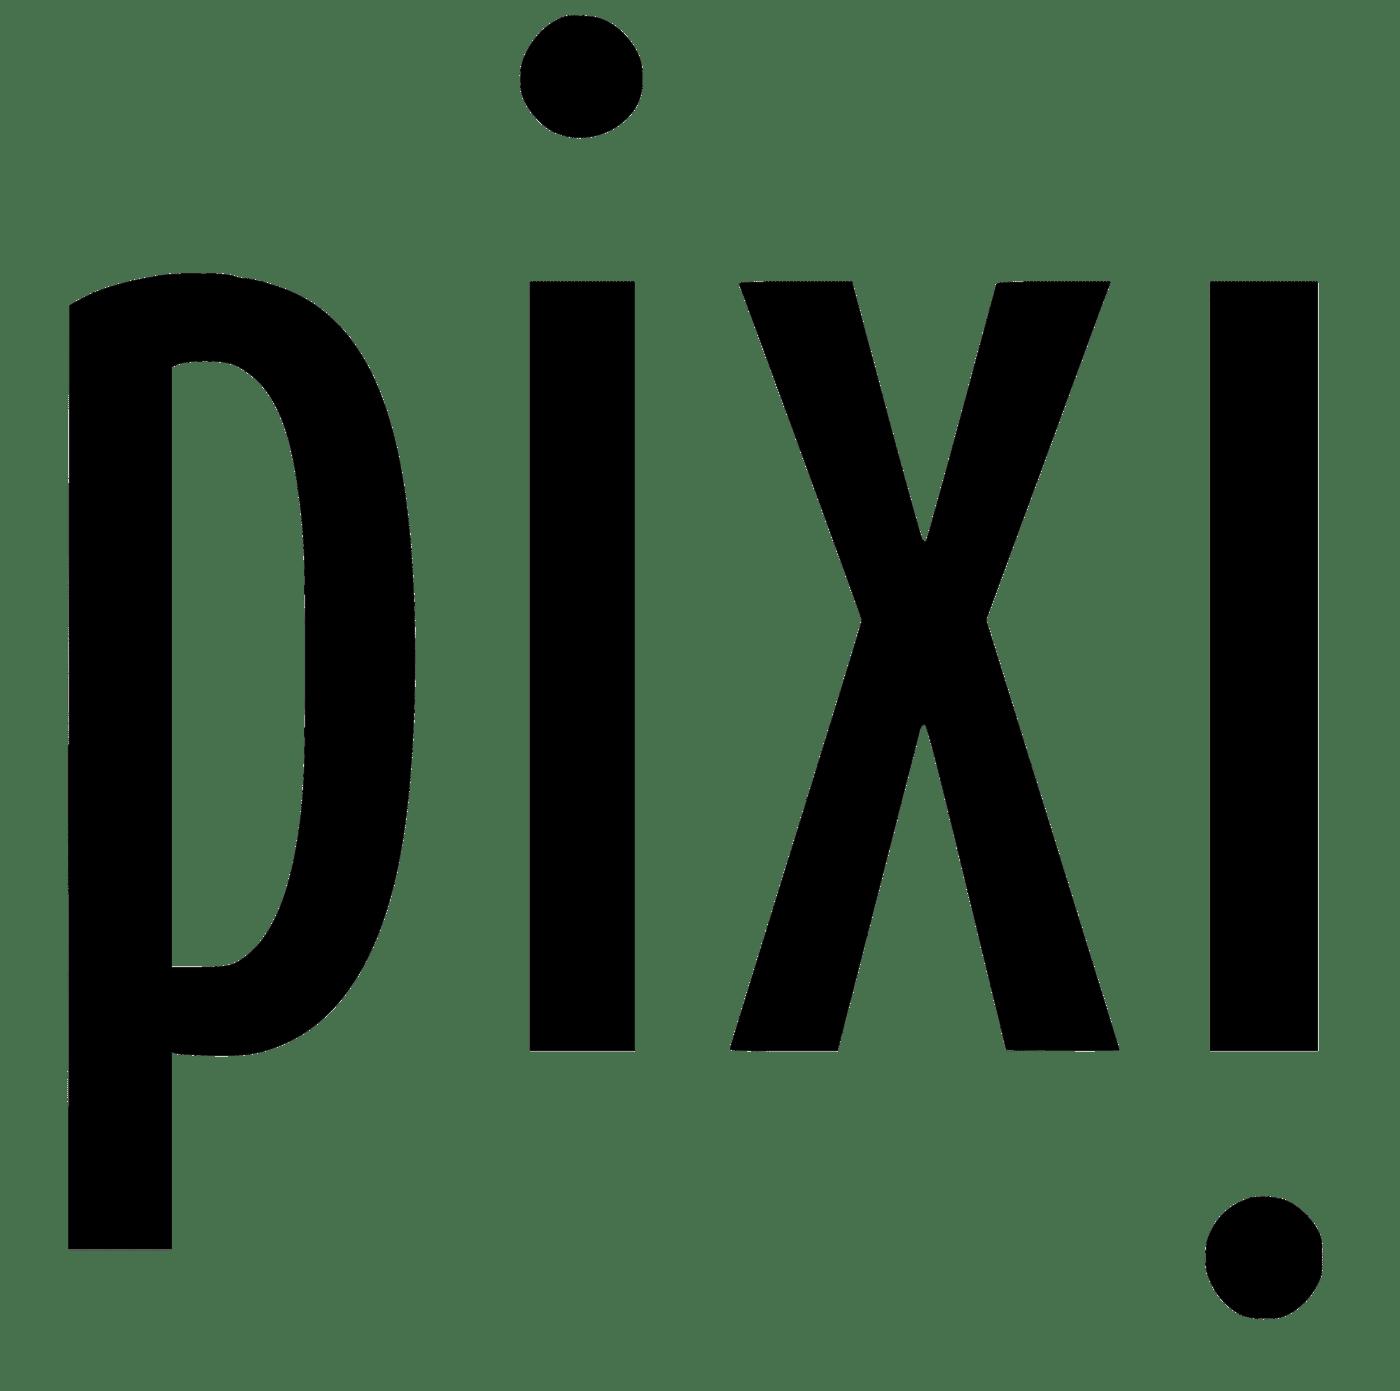 Pixi_logo copy